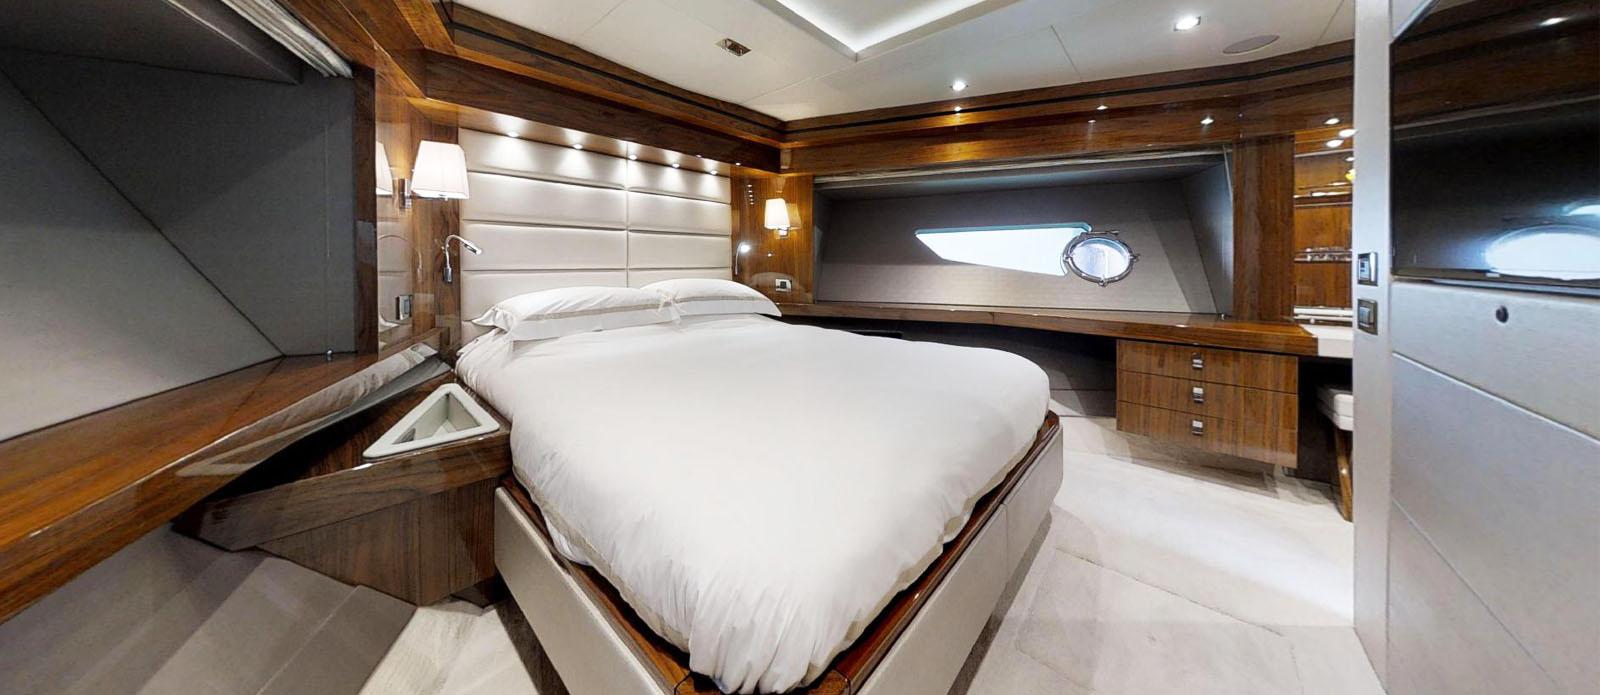 Sunseeker-86-Yacht-MiBowt-Master-Cabin